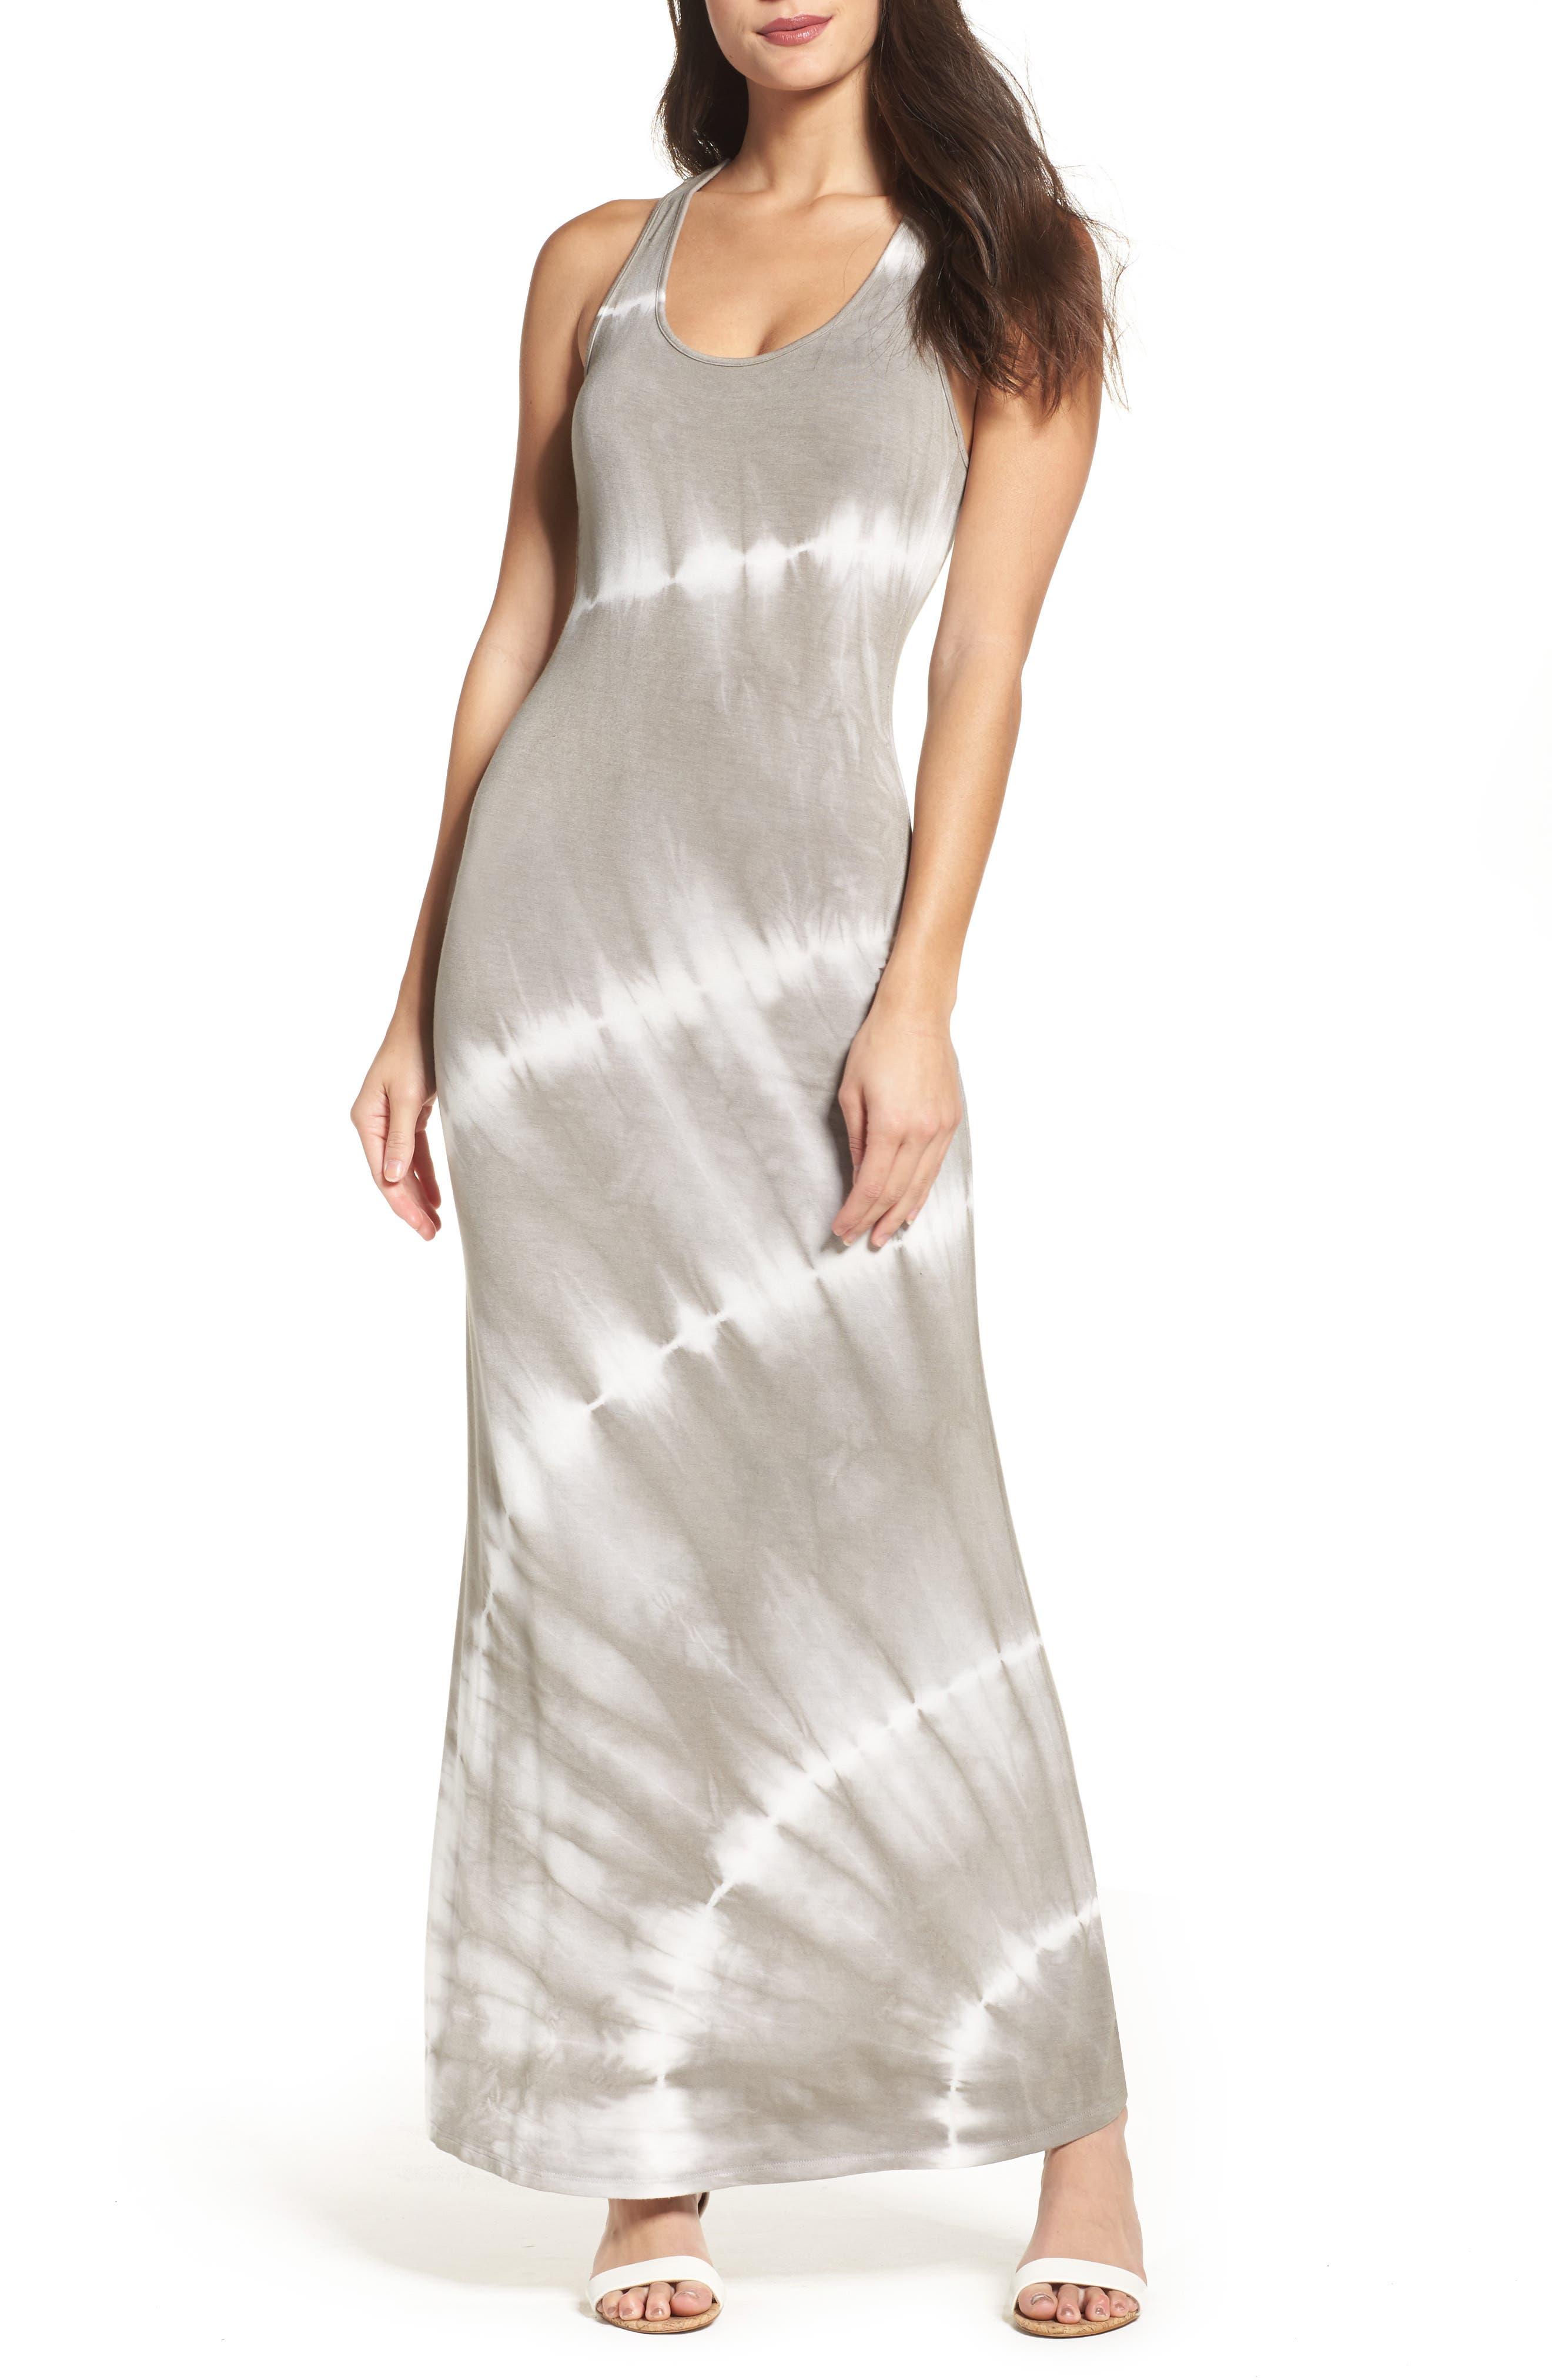 Tie Dye Racerback Maxi Dress,                             Alternate thumbnail 2, color,                             GREY/ WHITE